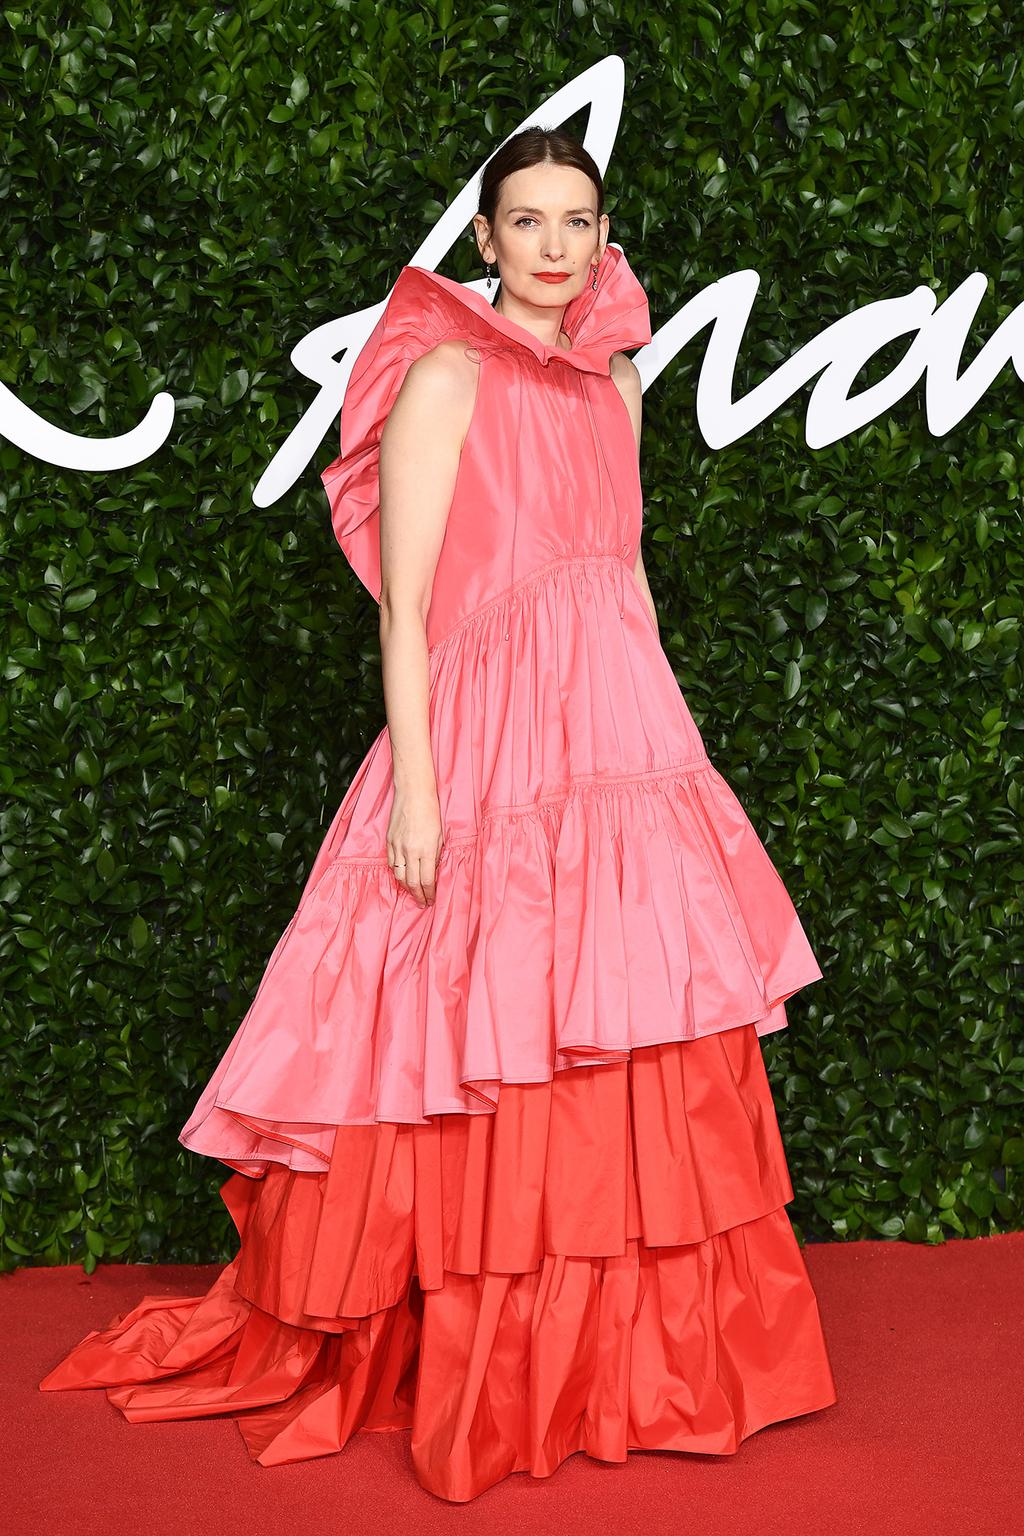 roksanda-ilincic-rock-color-block-dress-2019-british-the-fashion-awards